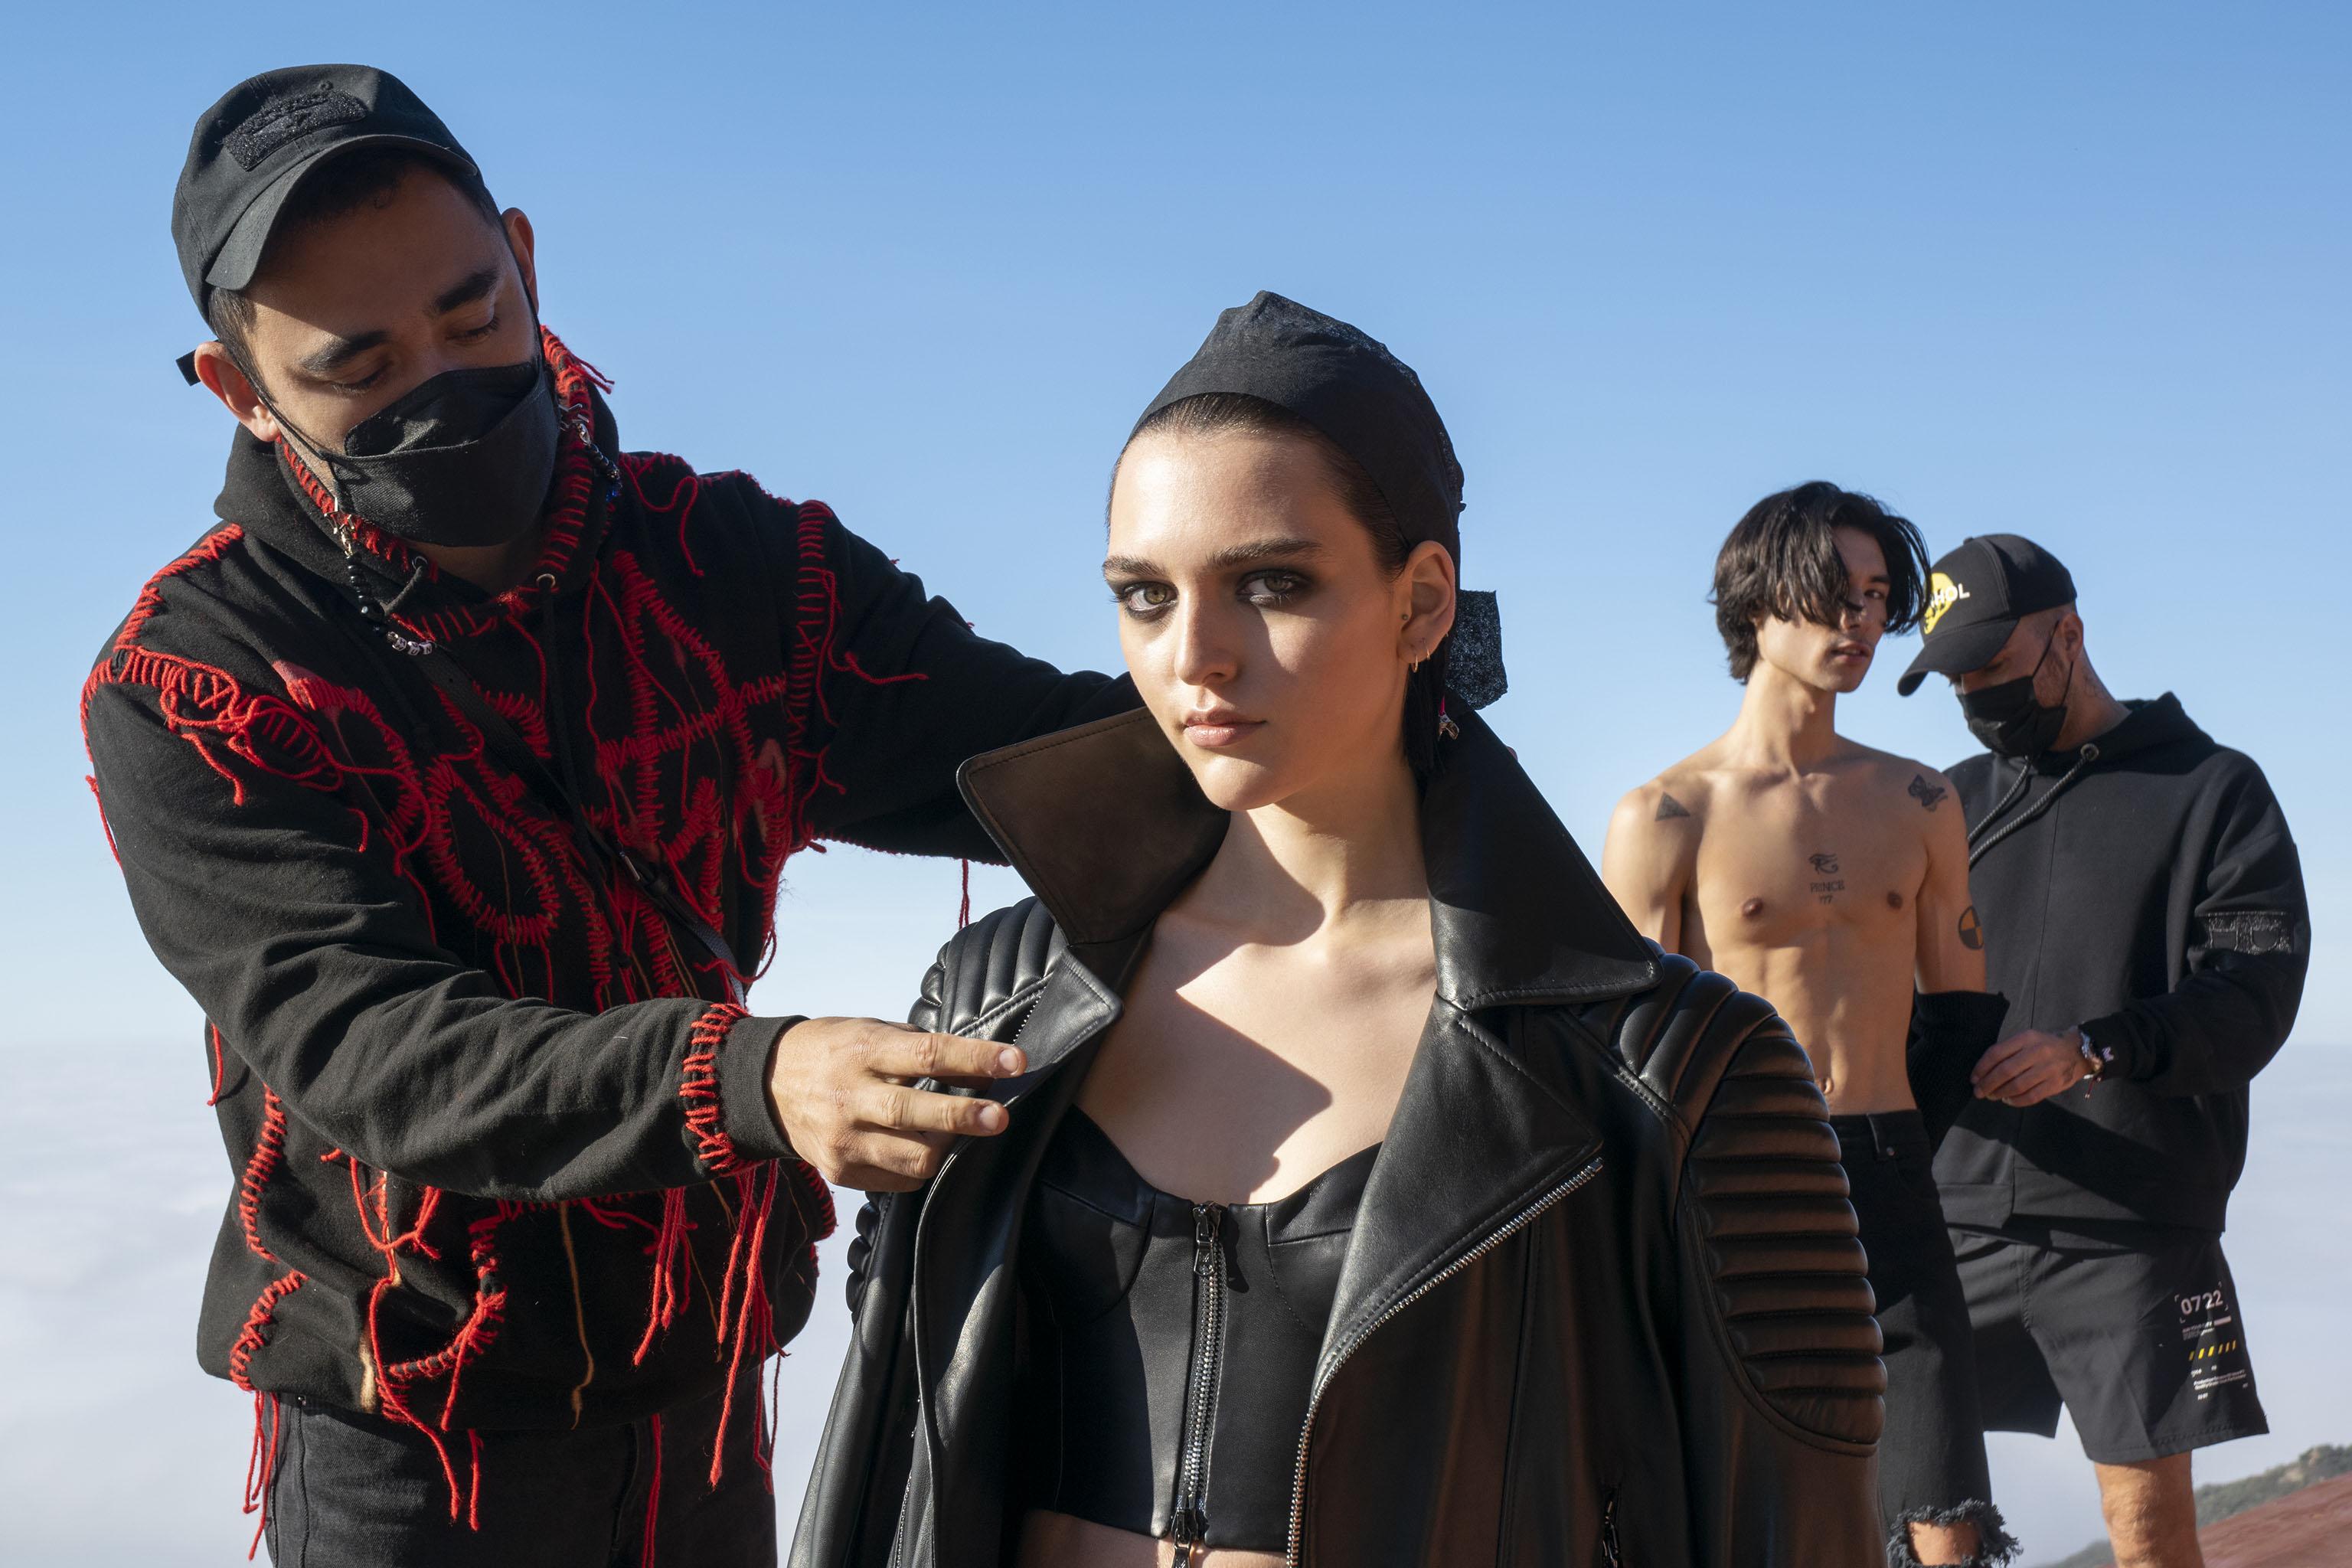 L.A.-based designer Marcell Pustul and stylist Nicola Formichetti prep the fall 2021 Marcell Von Berlin collection film in Malibu, Calif. on Feb. 8, 2020.